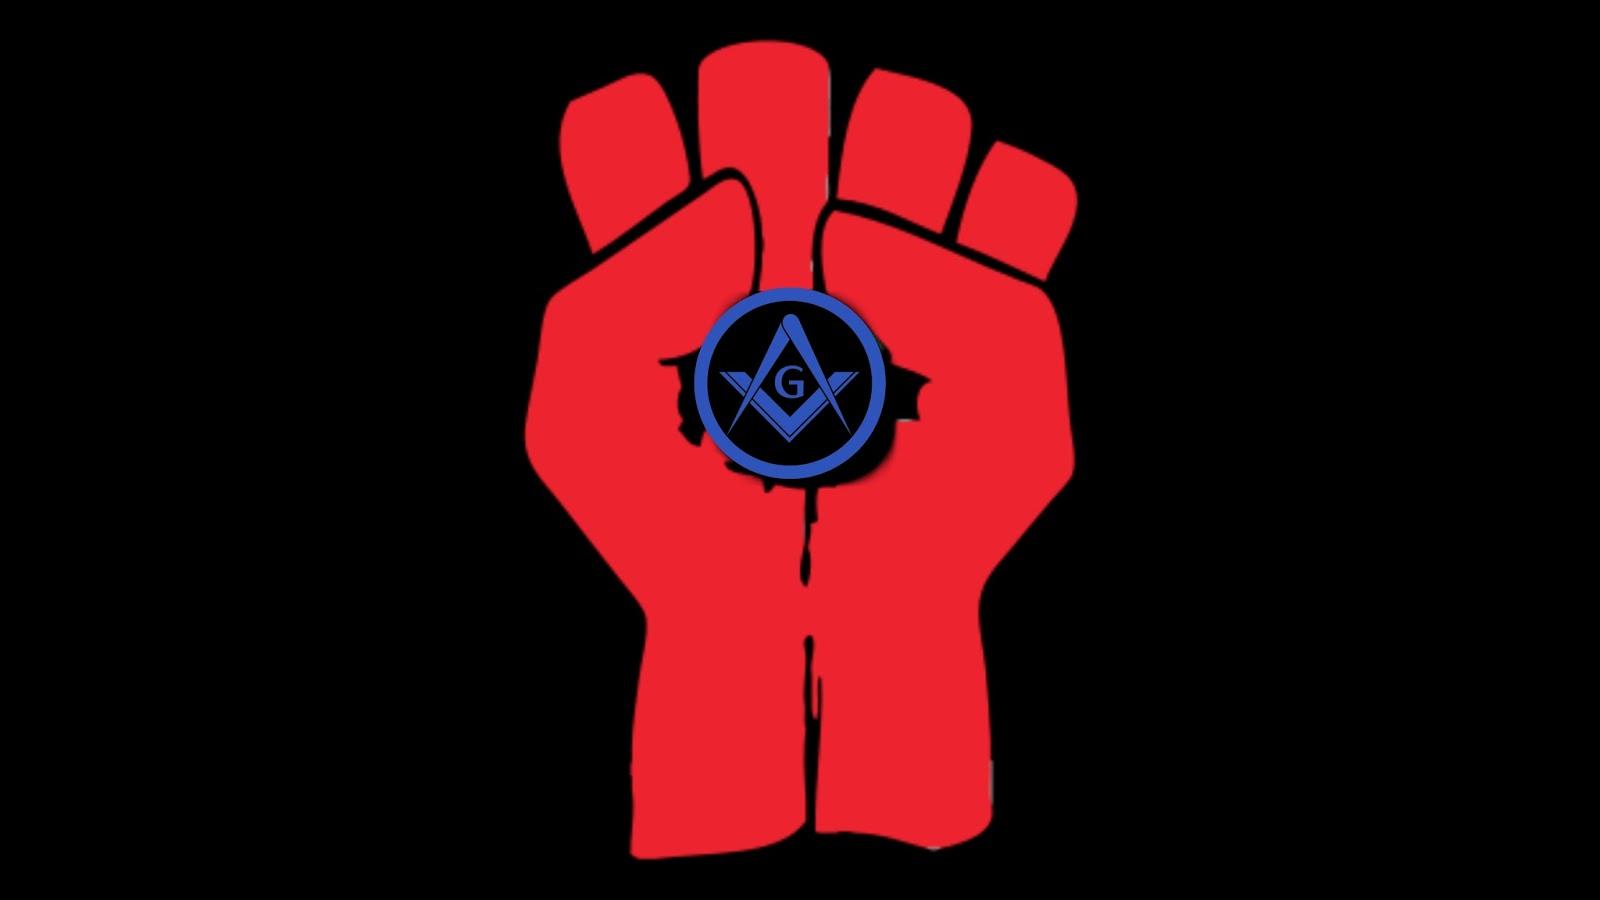 The Midnight Freemasons Gonzo Freemasonry